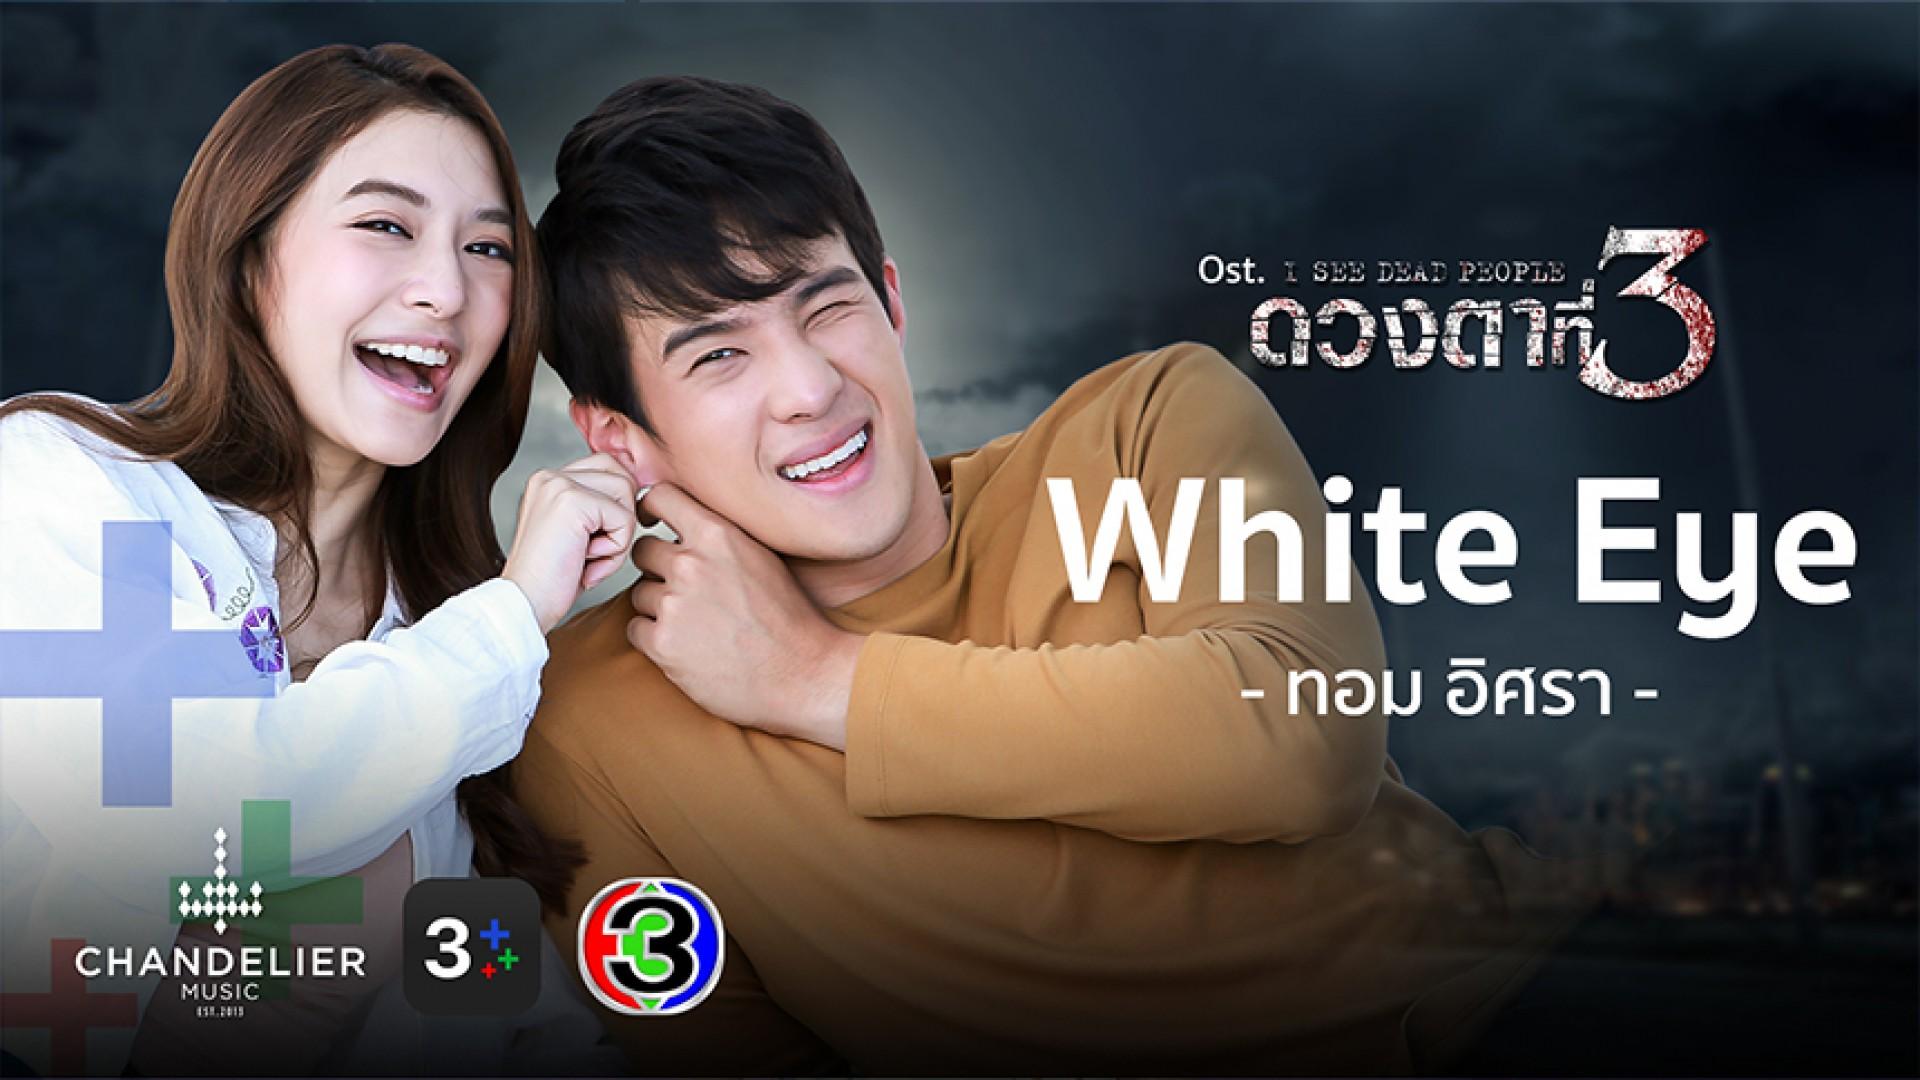 White Eye Ost.ดวงตาที่ 3   ทอม อิศรา   Official MV